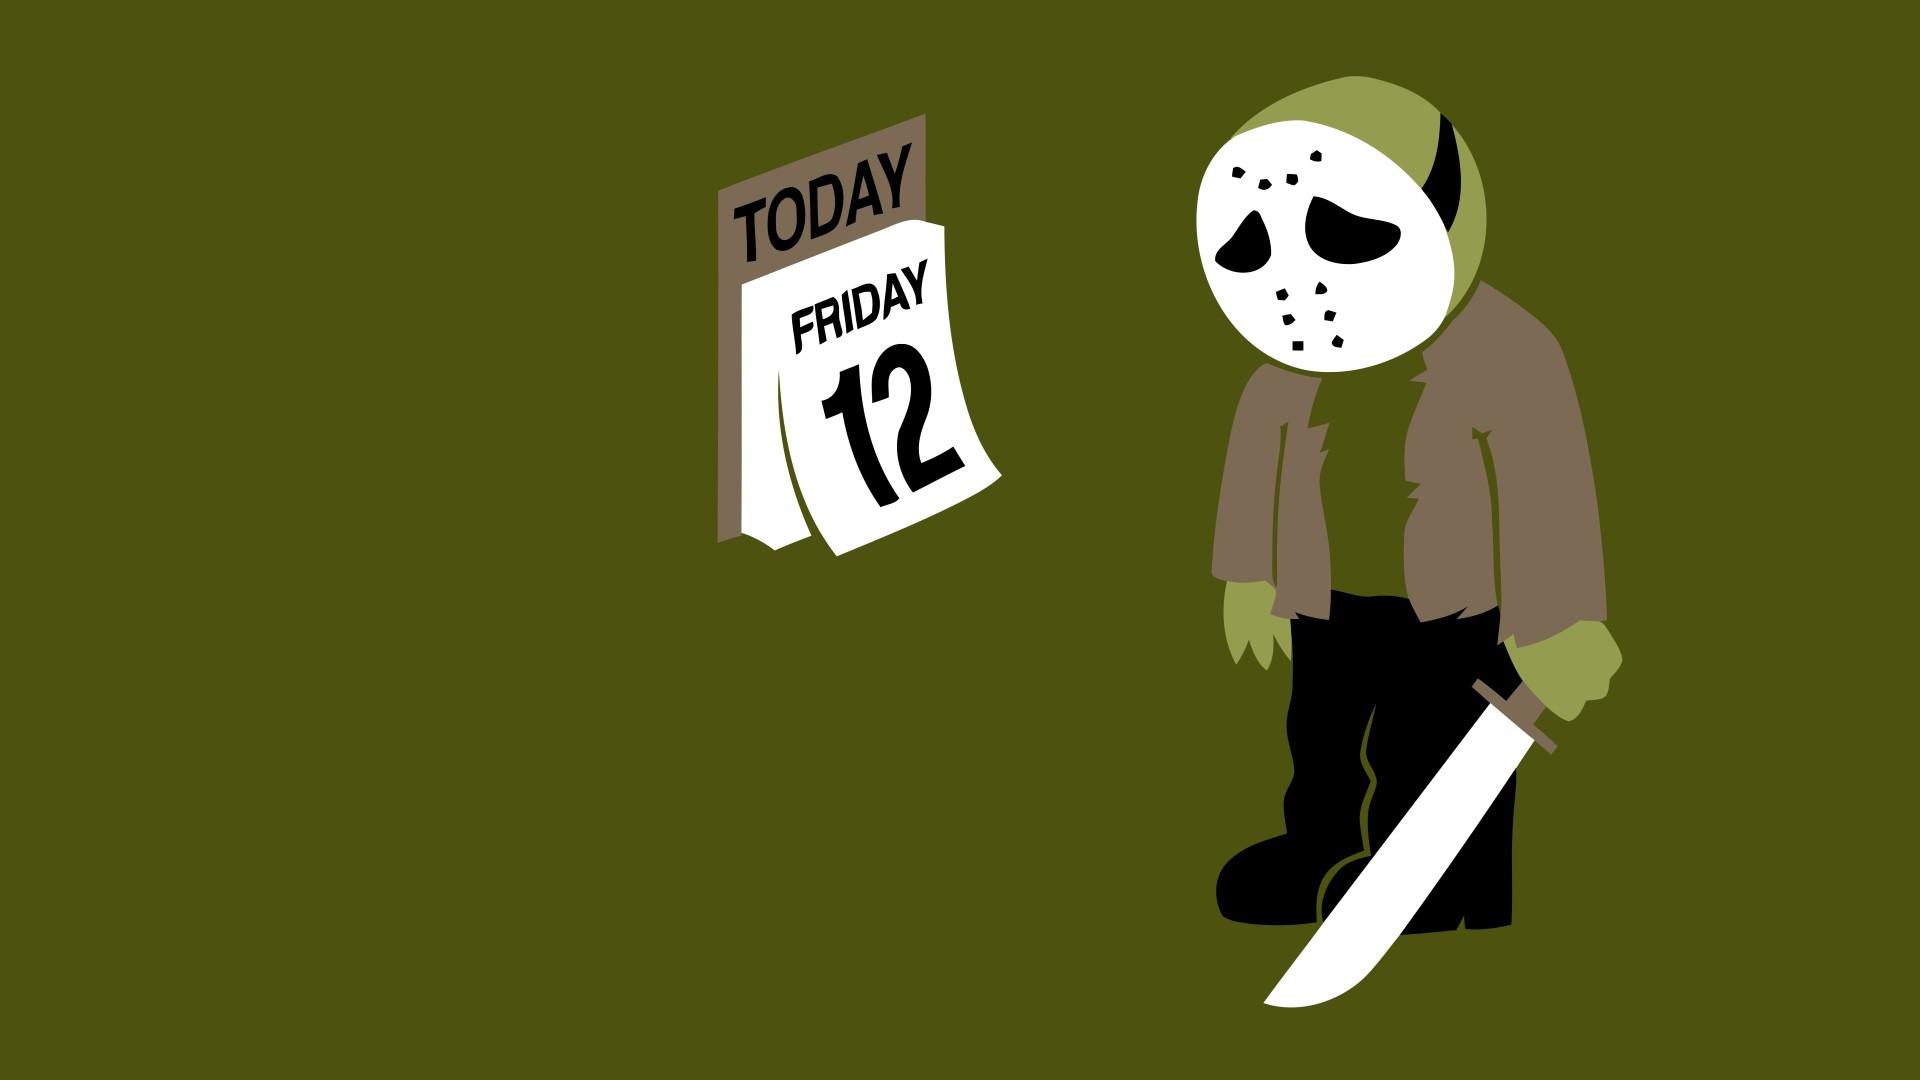 Illustration Simple Background Humor Mask Cartoon Sad Calendar Ball Brand Machete Jason Voorhees Hockey Font